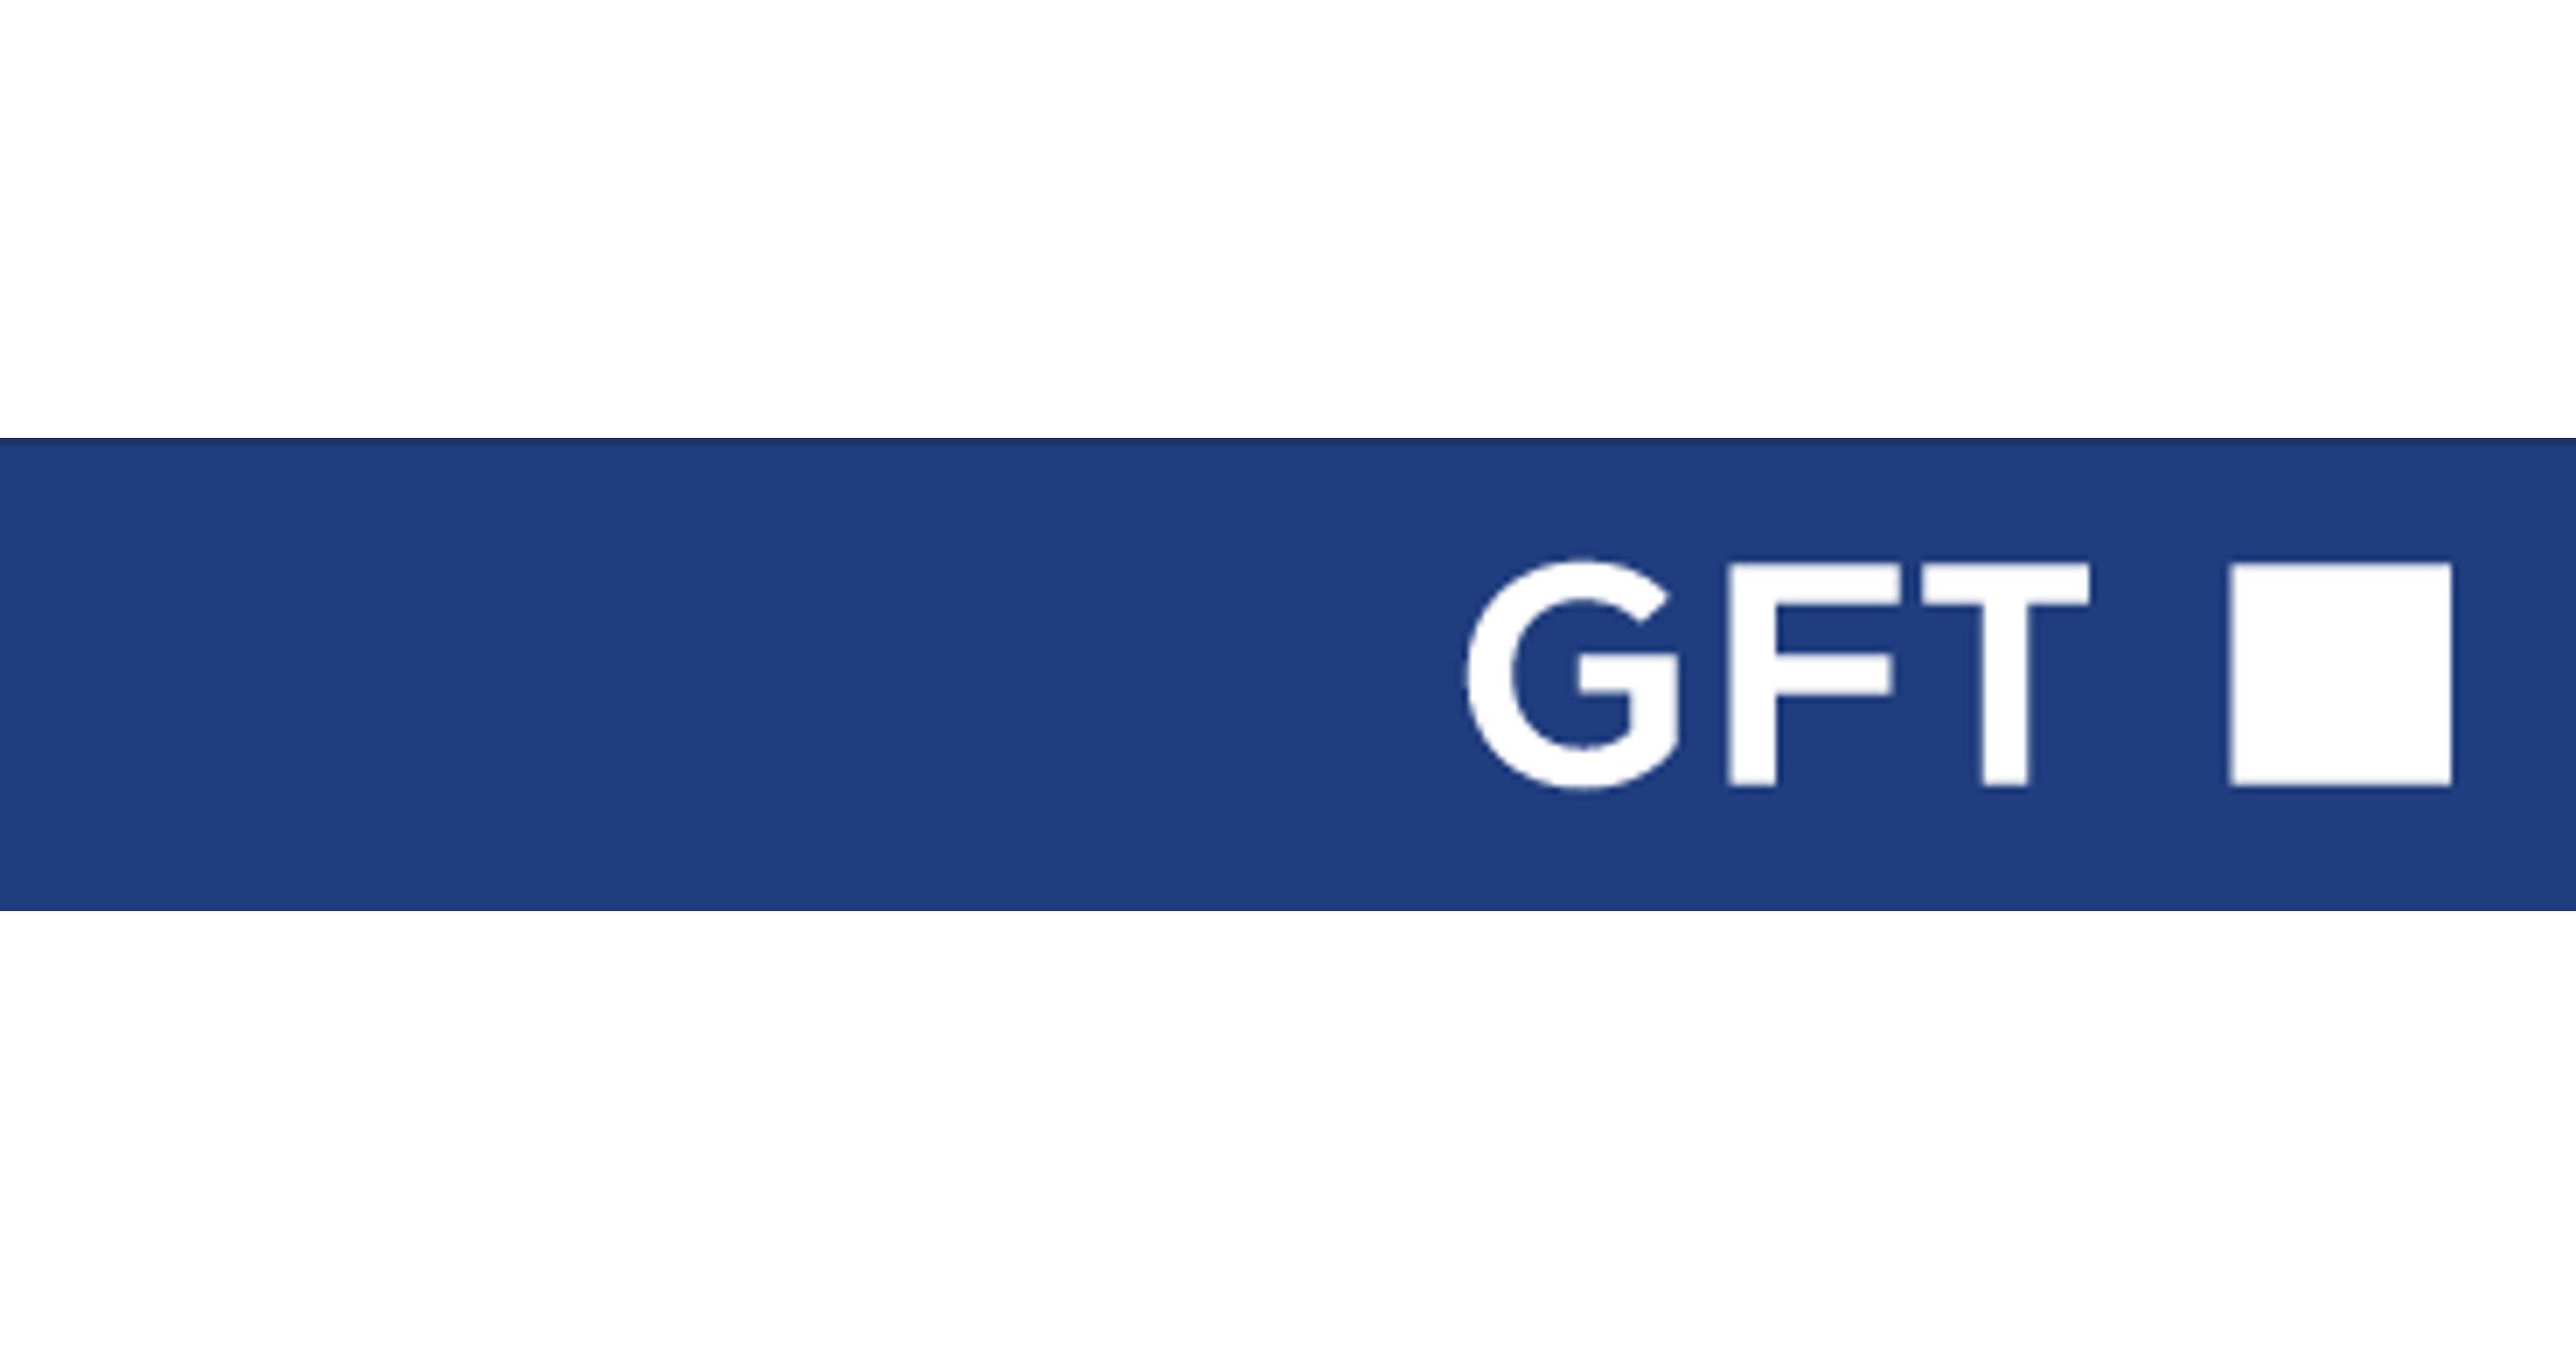 GFT Forex Broker Information